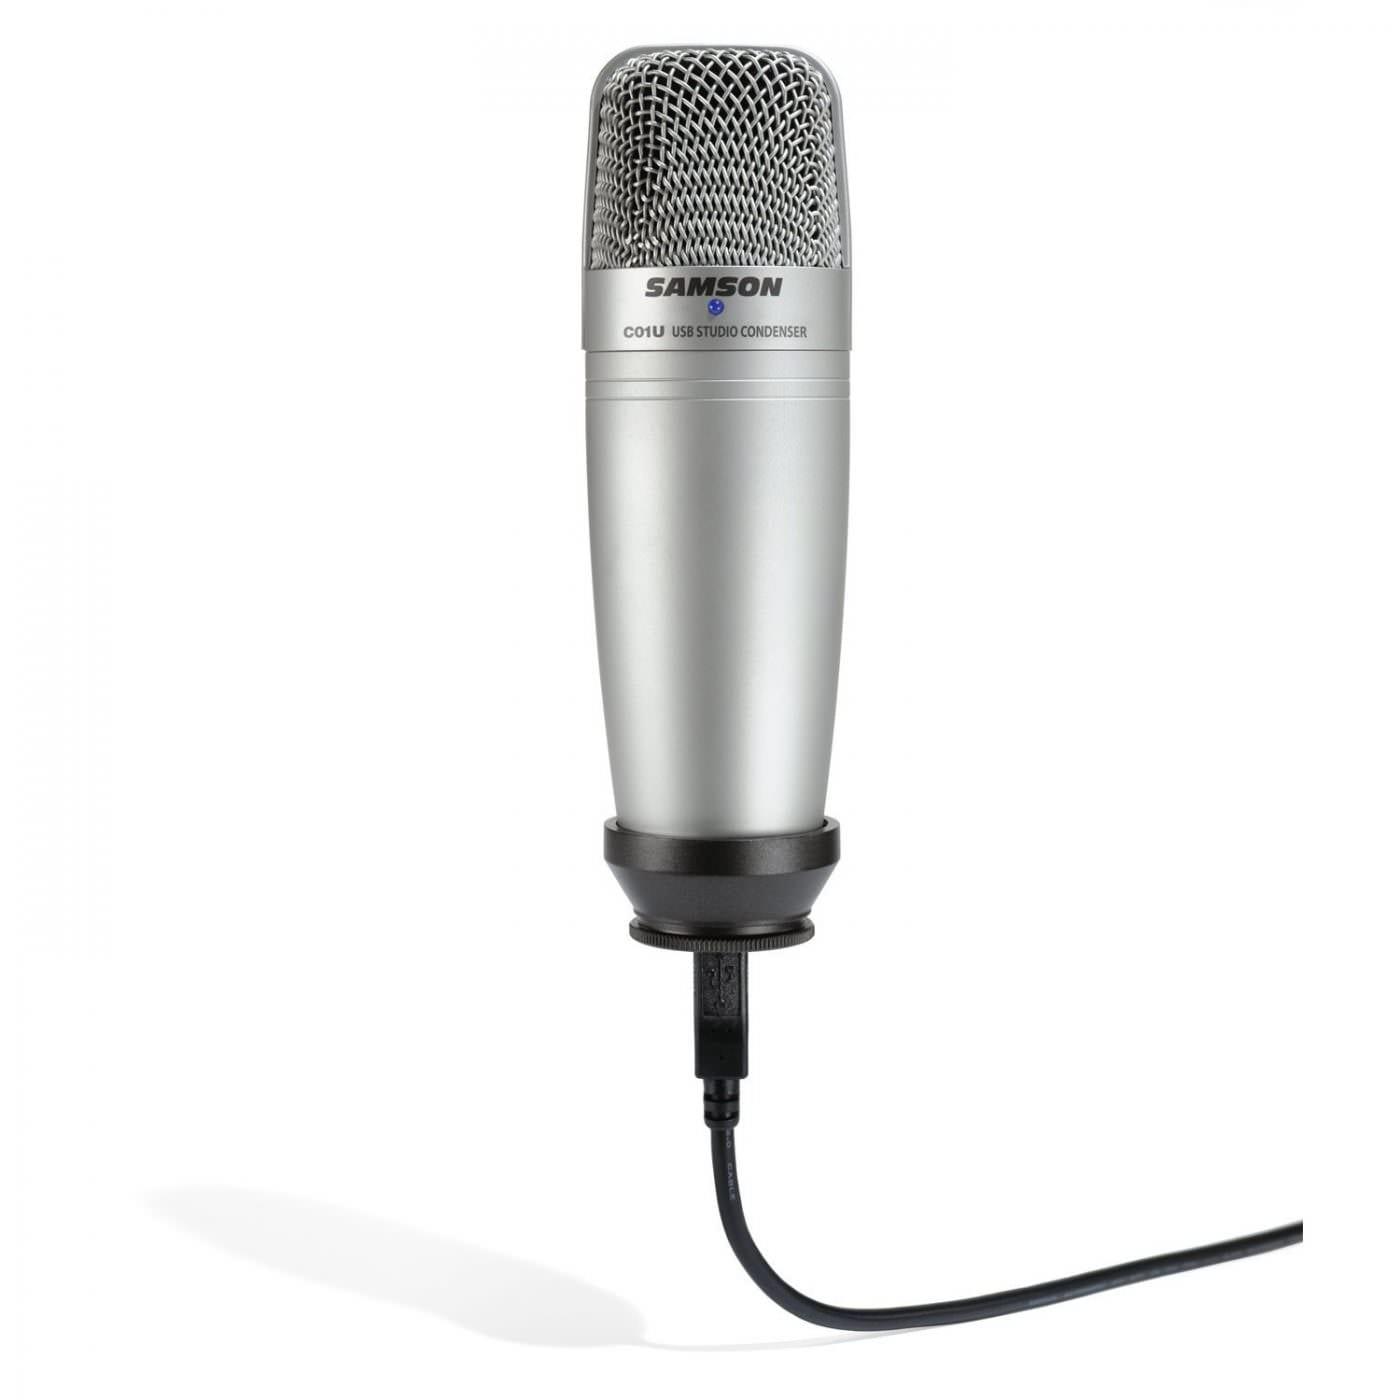 Samson C01 Condenser Microphone for Podcasting